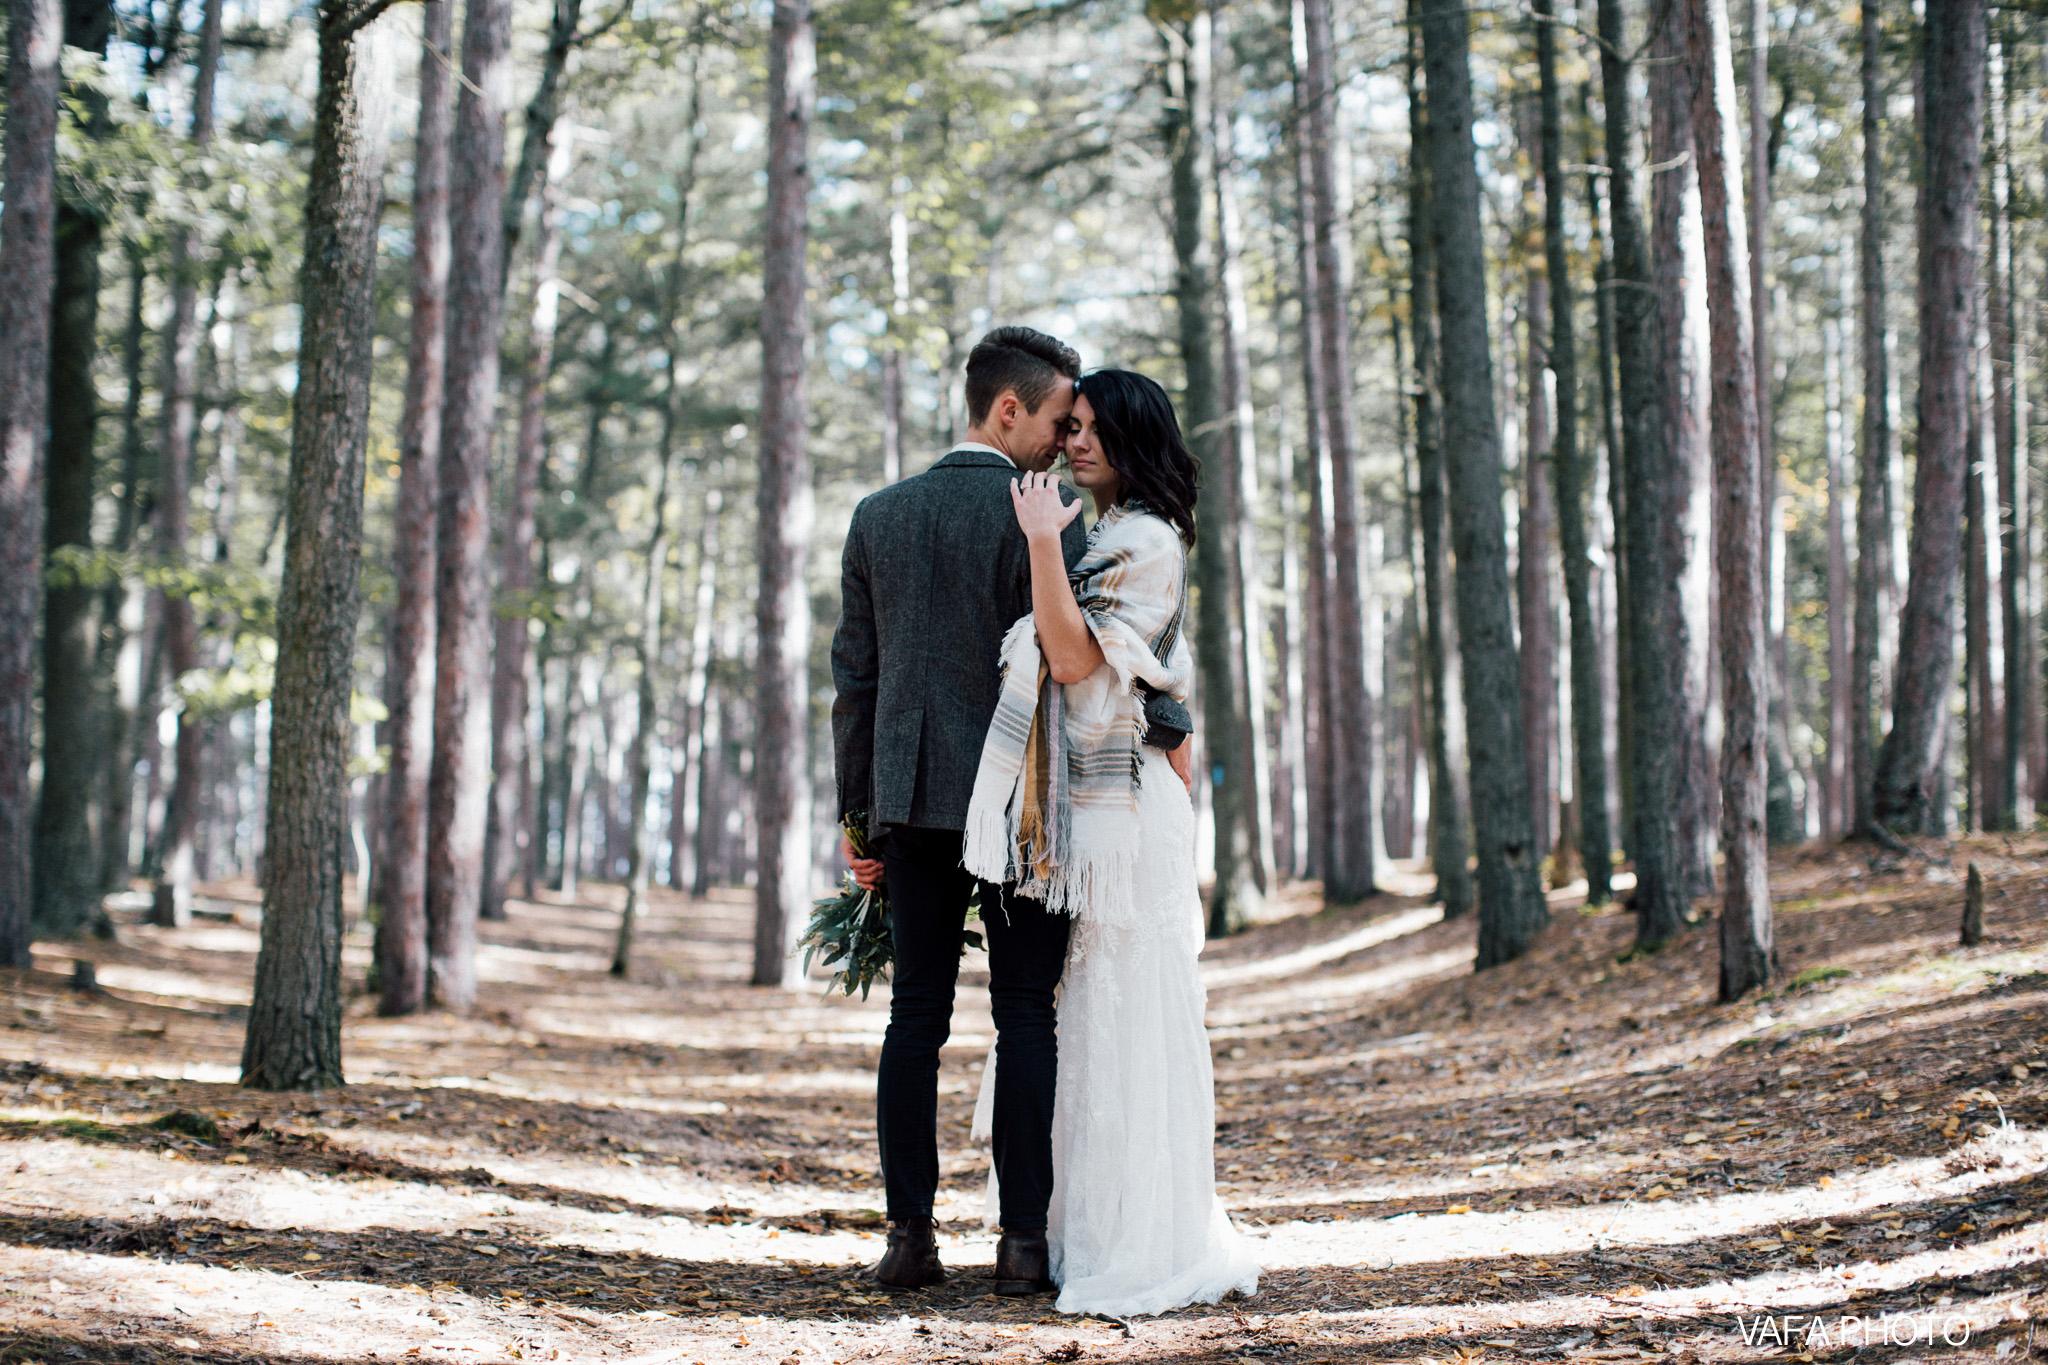 Hogback-Mountain-Wedding-Chelsea-Josh-Vafa-Photo-530.jpg